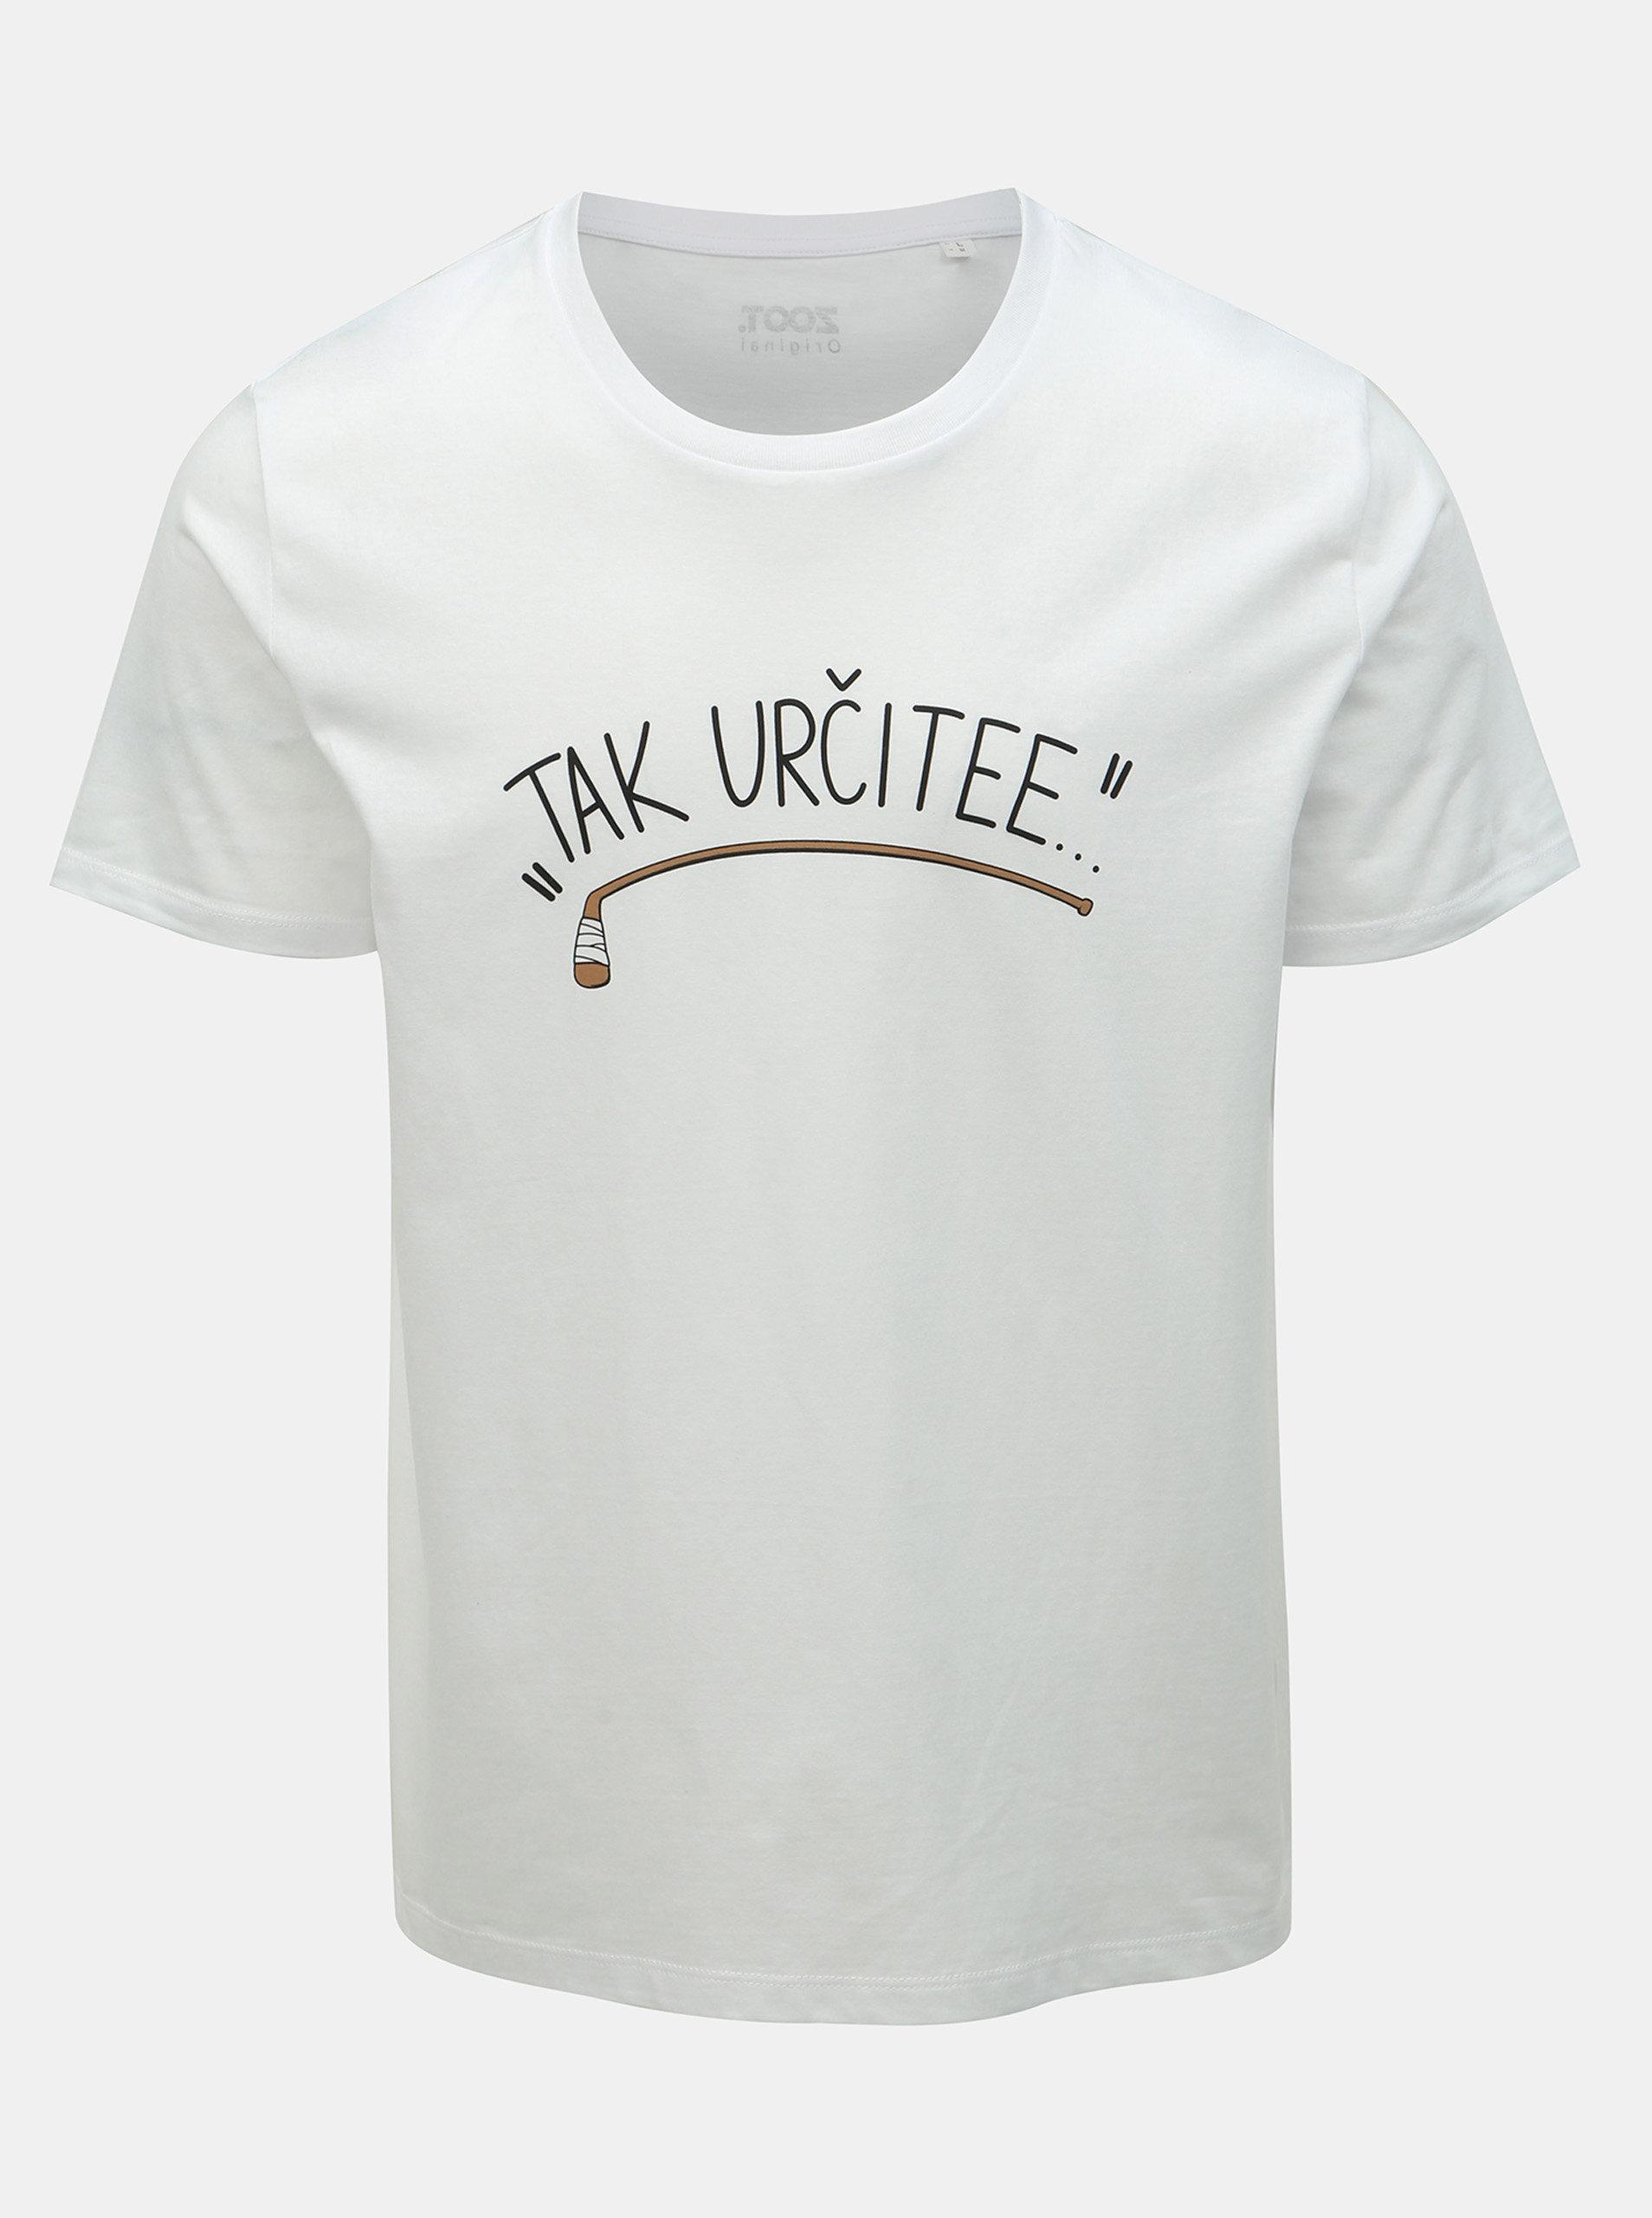 d7e72042b530b Biele pánske hokejové tričko ZOOT Original Tak určitee   ZOOT.sk